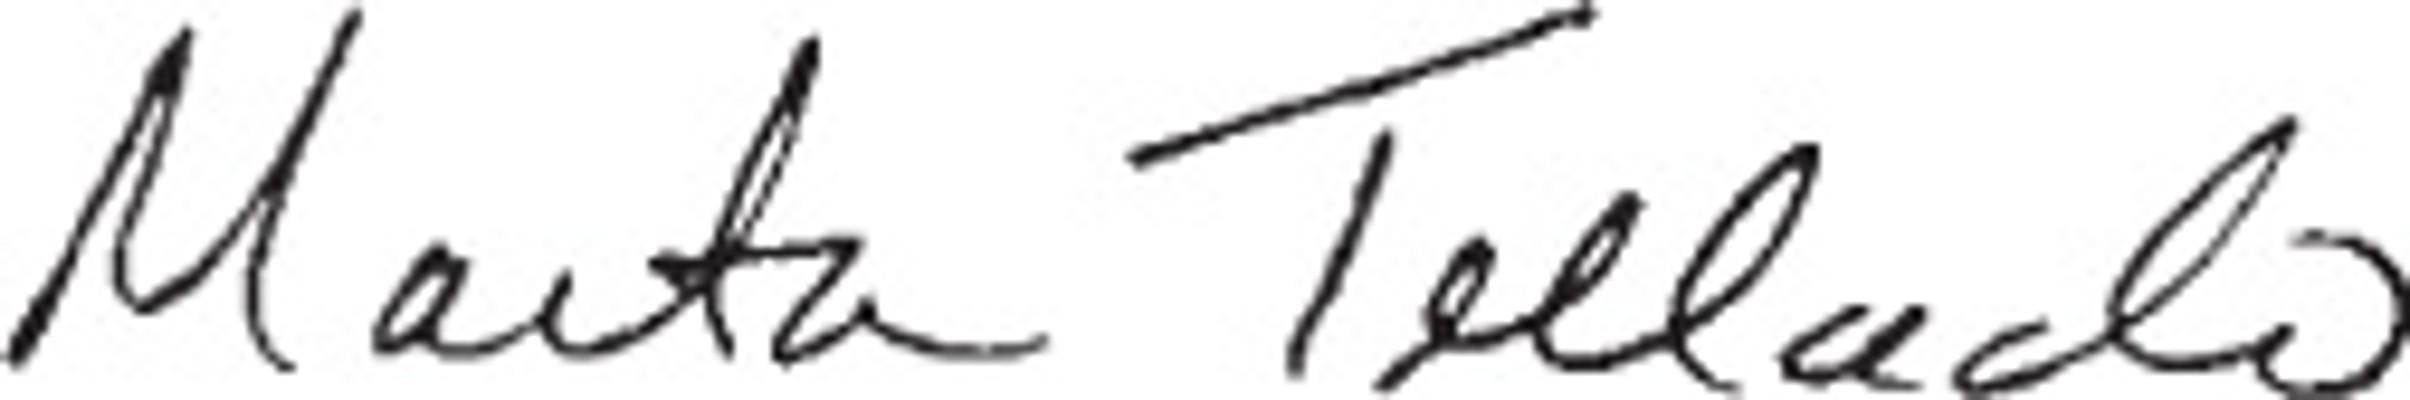 f0006-02